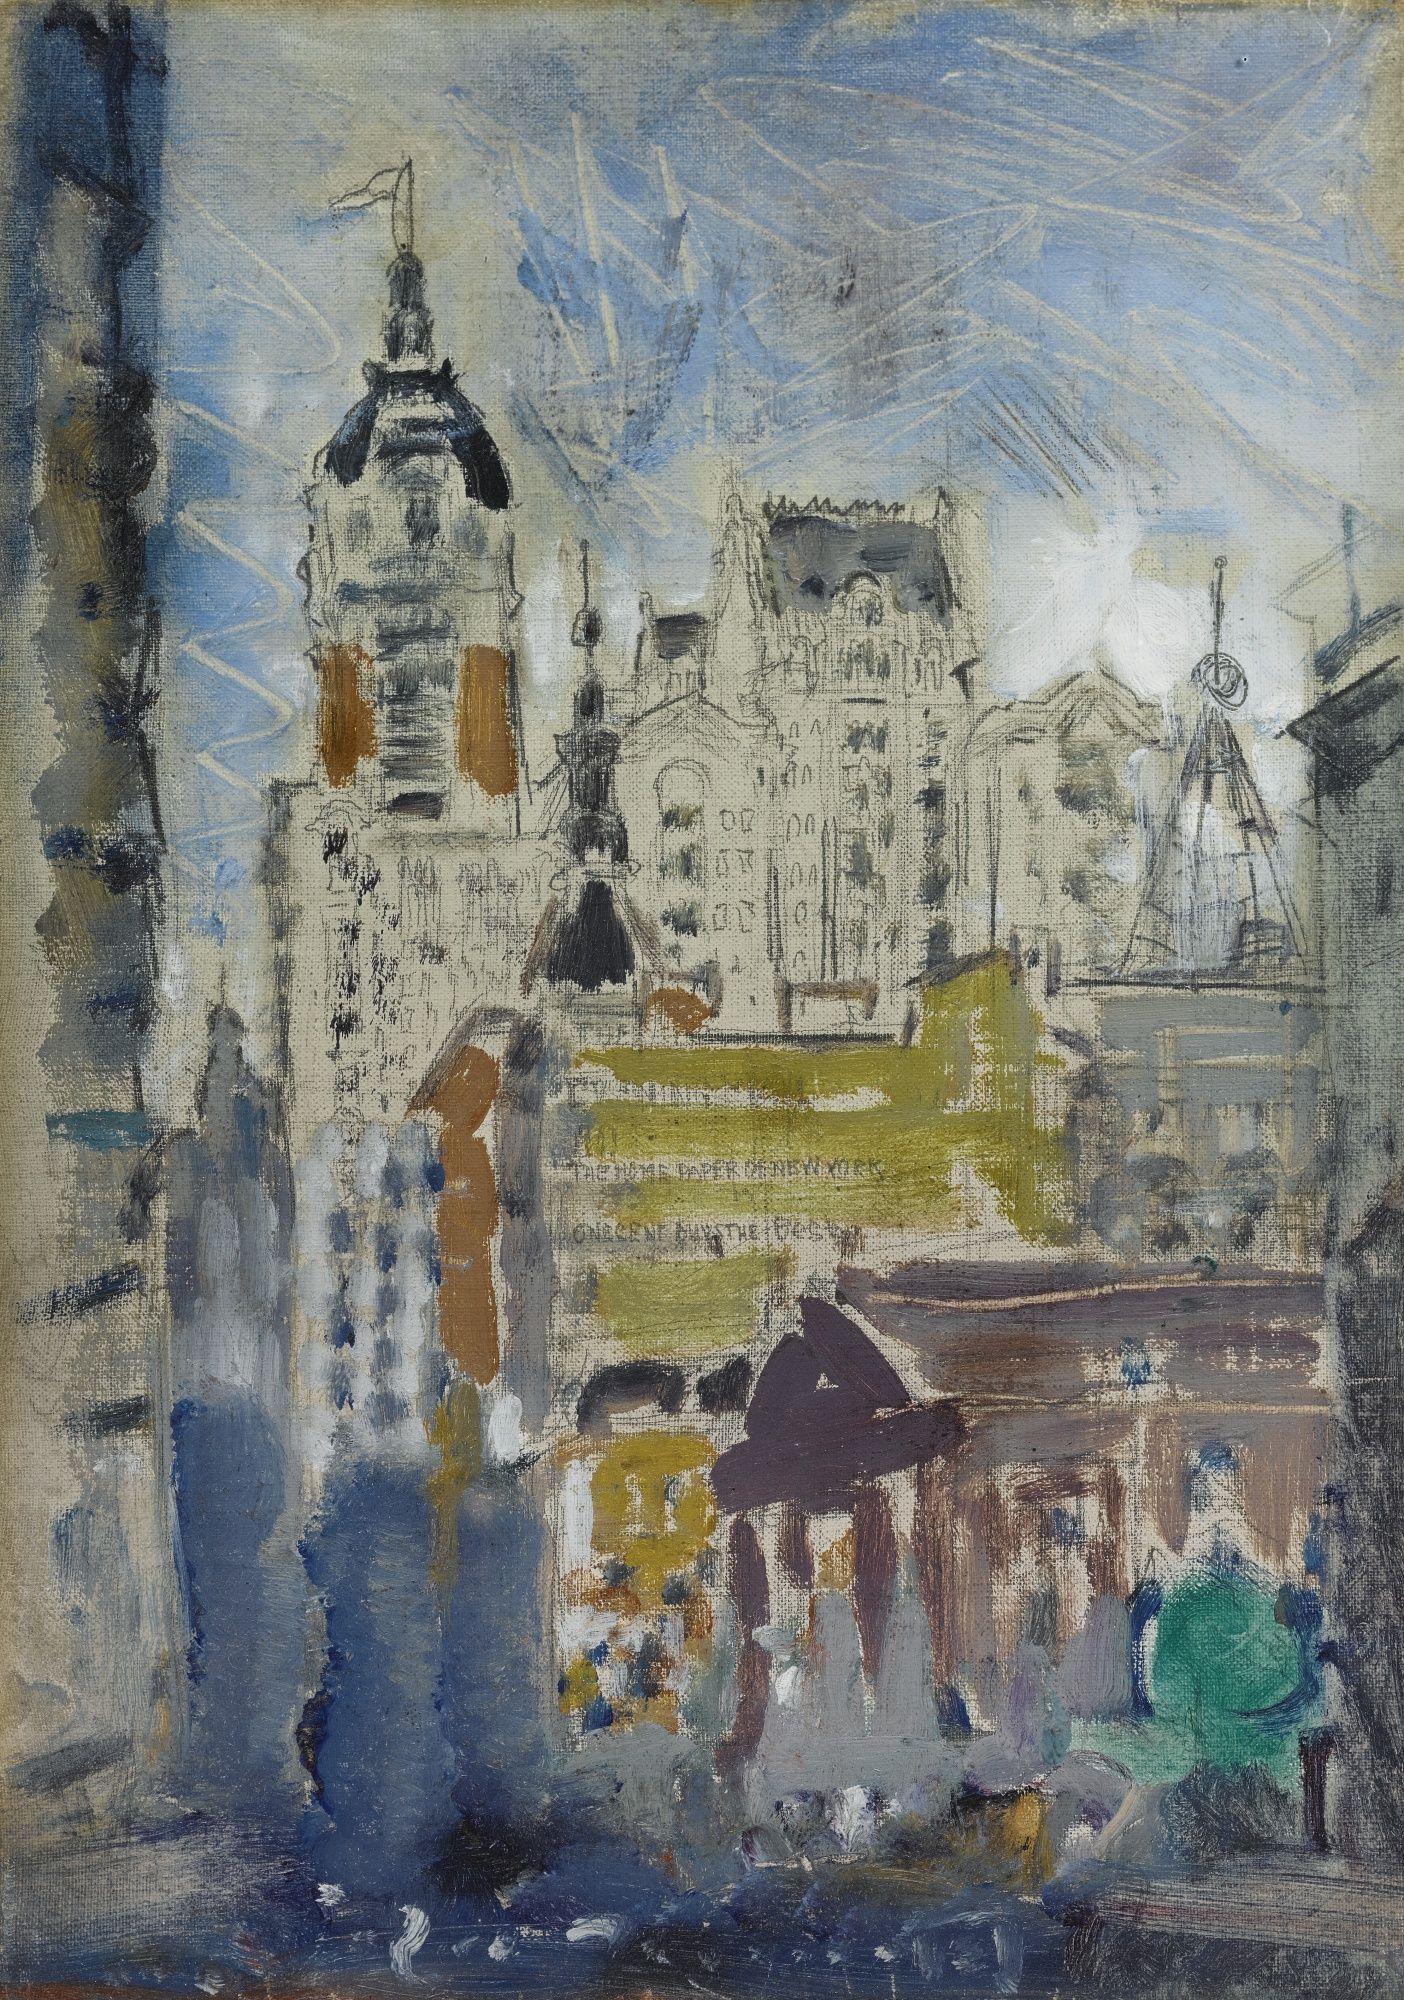 John Marin 1872 - 1953 DOWNTOWN NEW YORK (SINGER BUILDING)